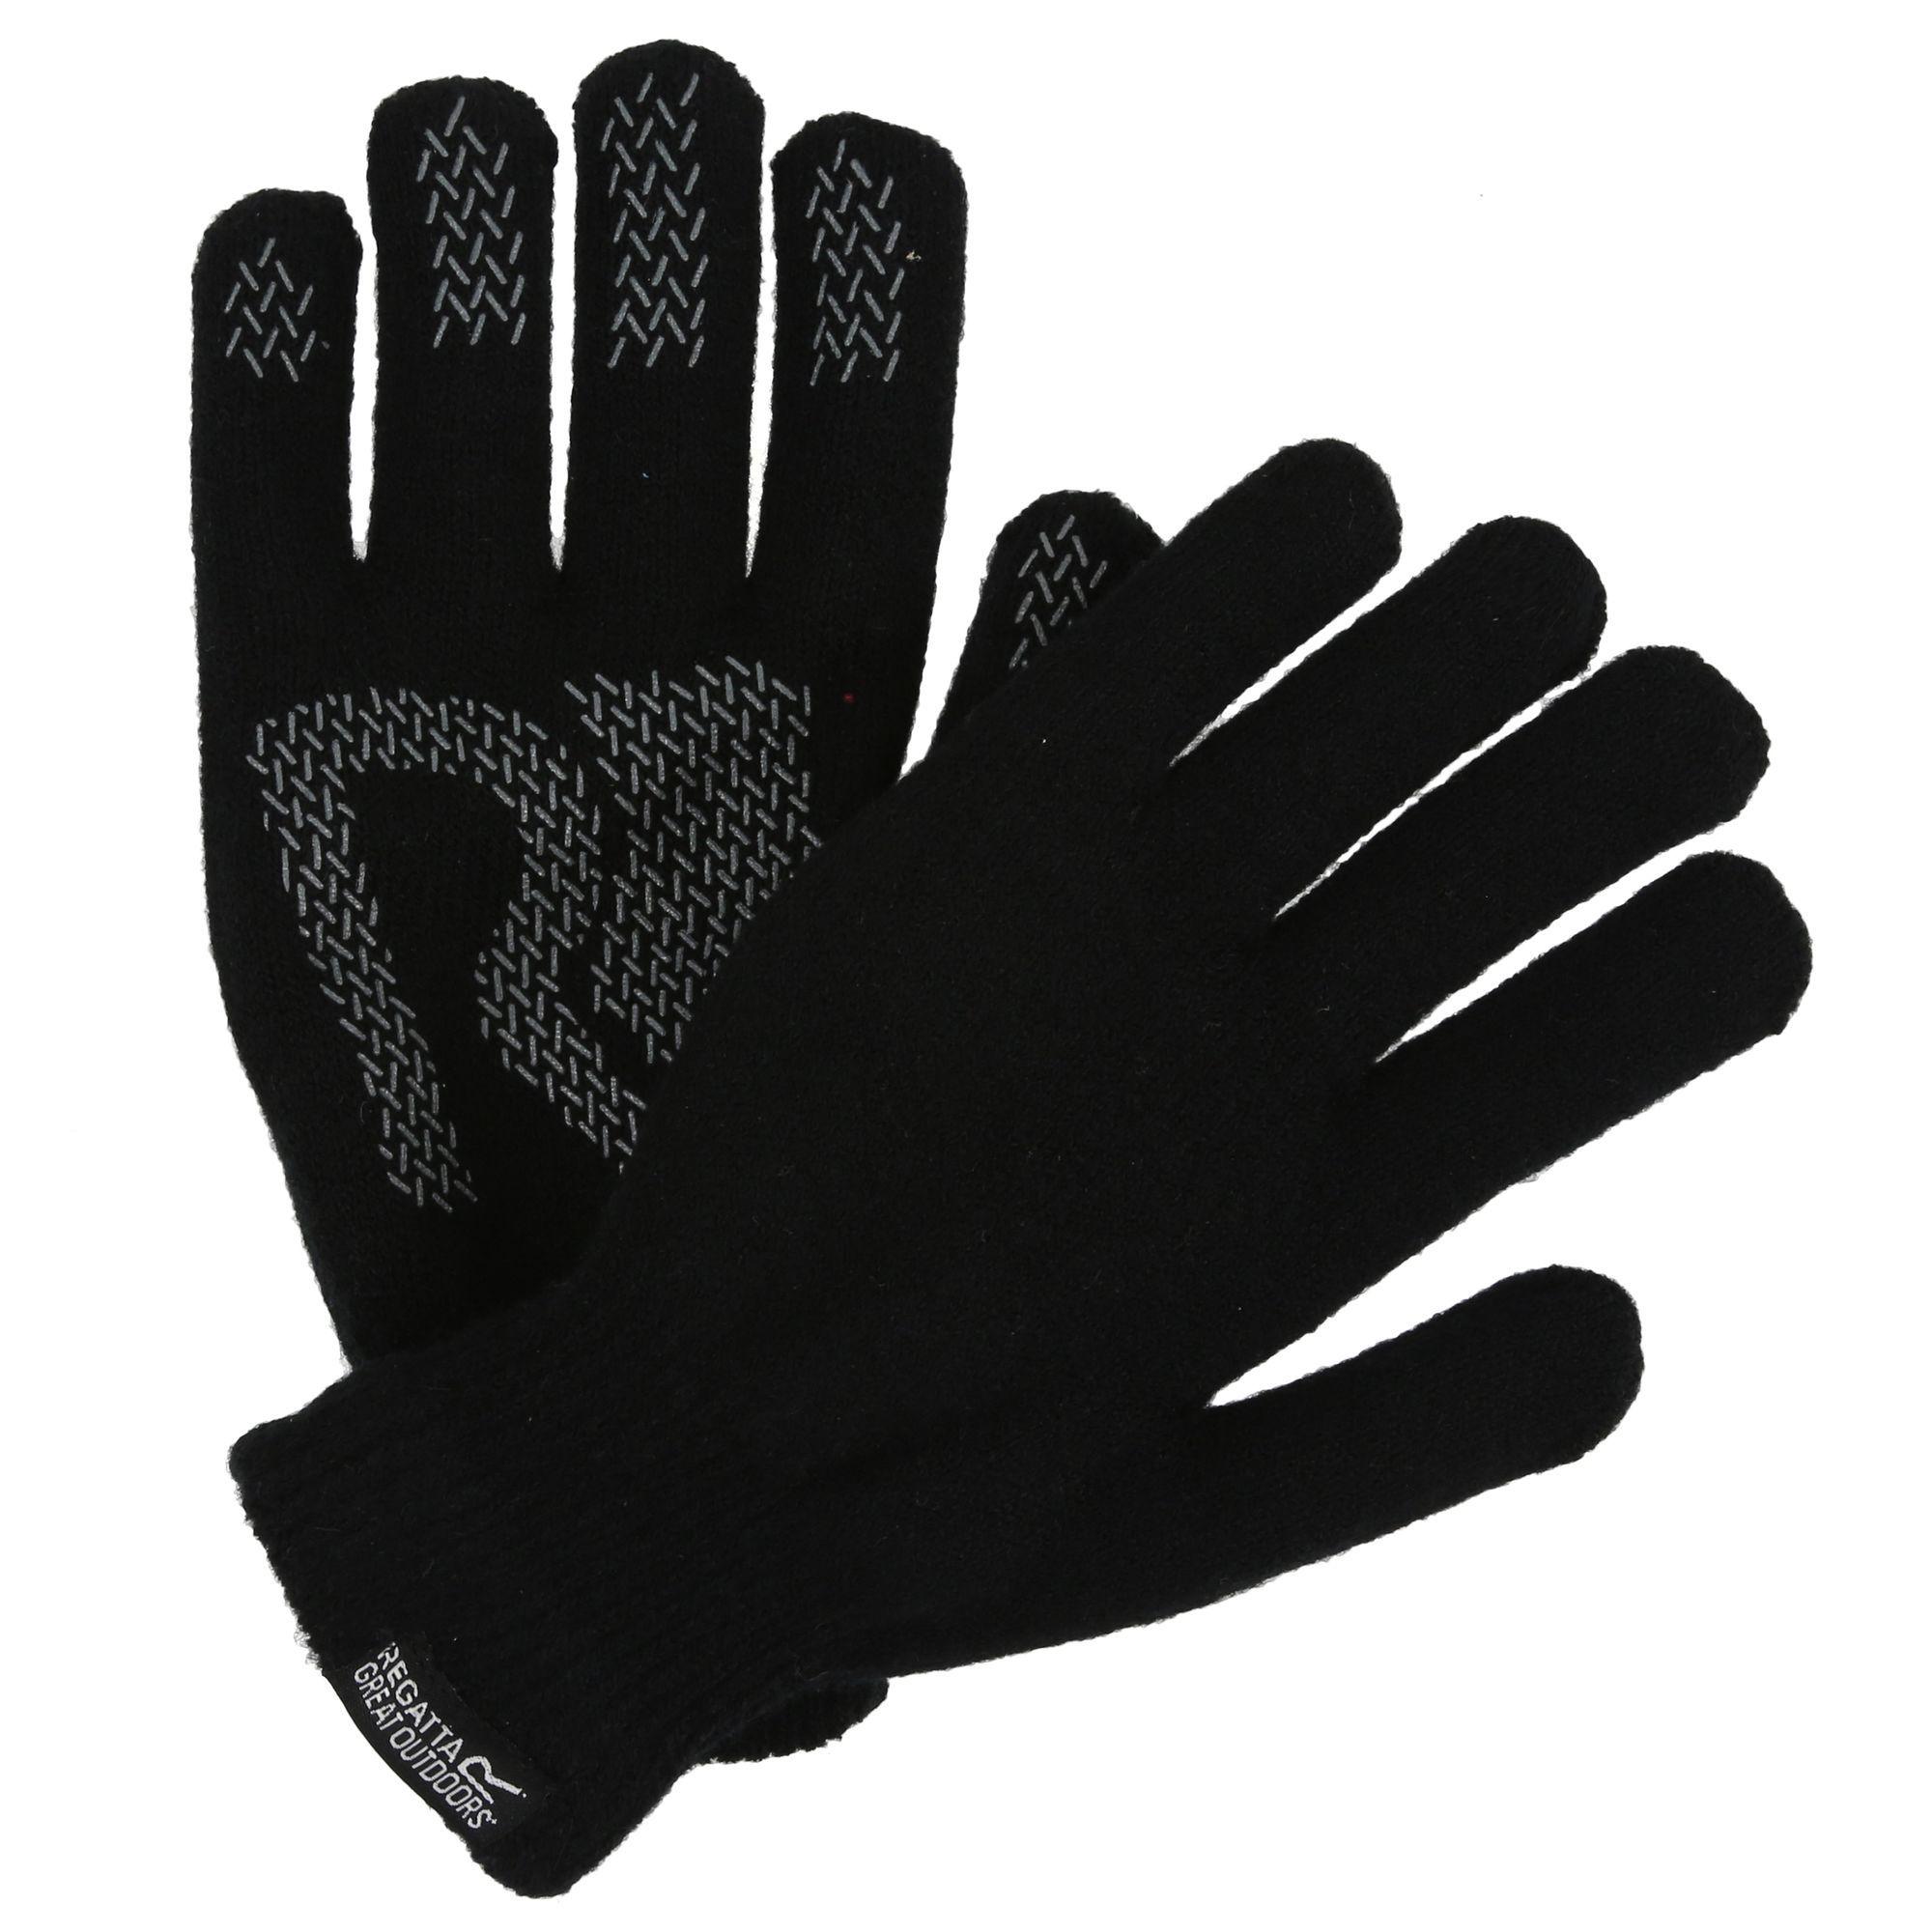 Regatta Great Outdoors Unisex Brevis Knit Gloves